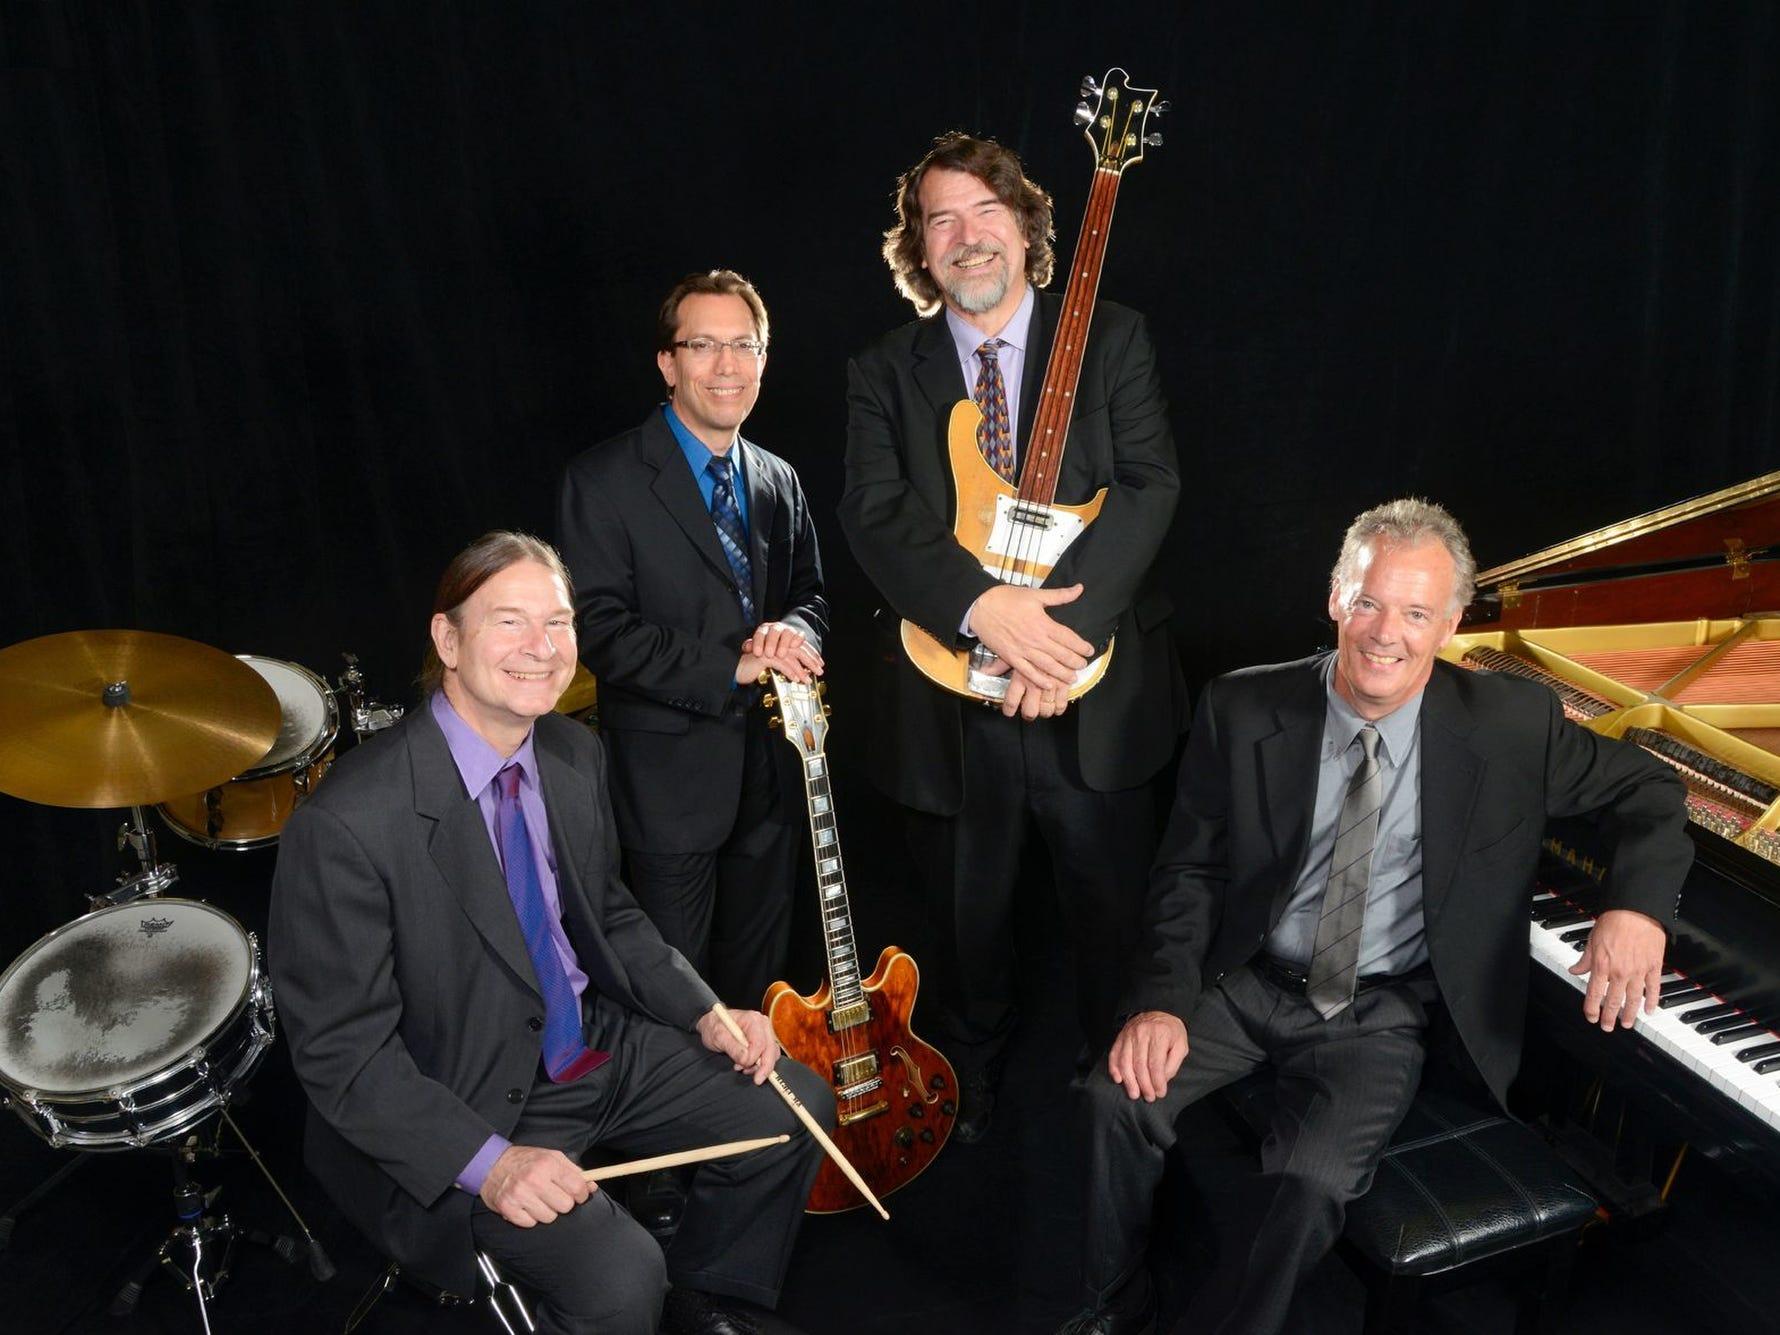 NOV. 25BRUBECK BROTHERS QUARTET: 7:30 p.m. Schermerhorn Symphony Center, $25-$130, nashvillesymphony.org